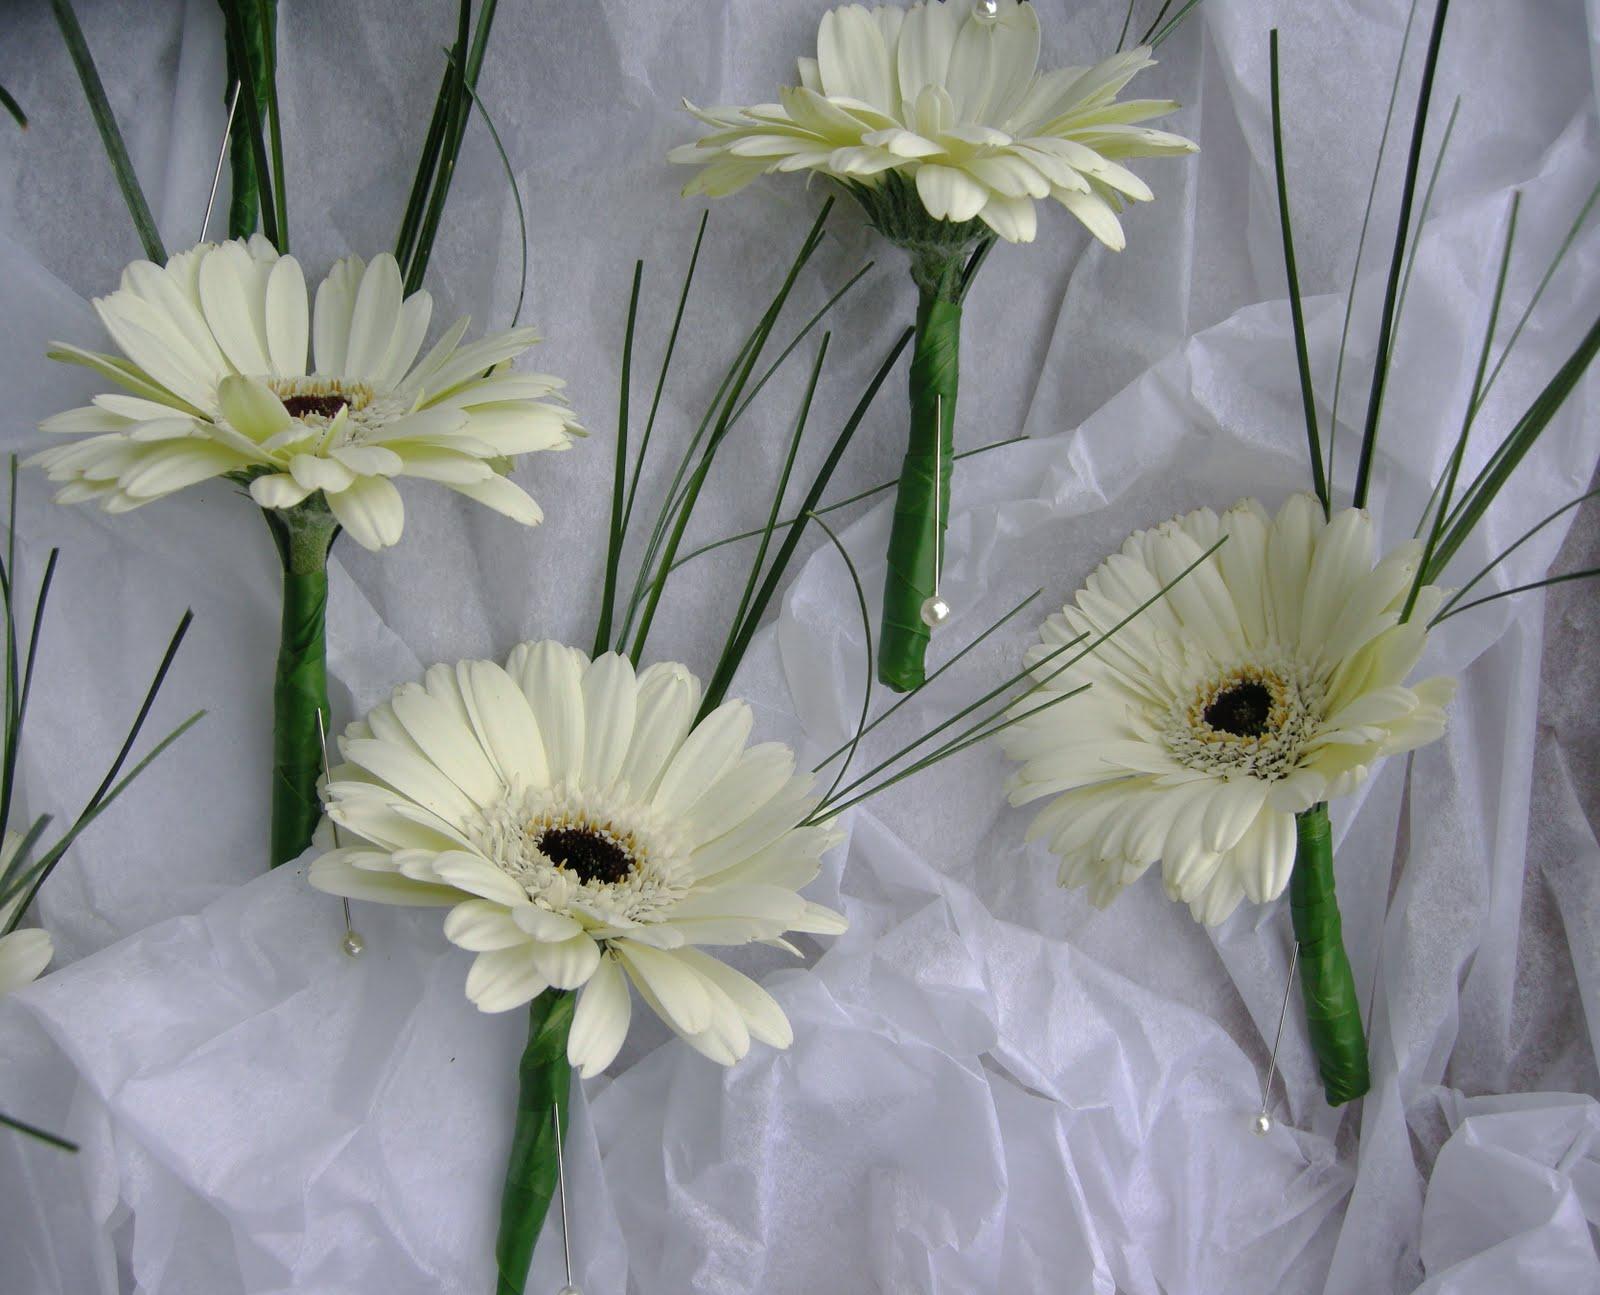 How To Make Wedding Buttonholes: Wedding Flowers Blog: Natalie's Winter Wedding